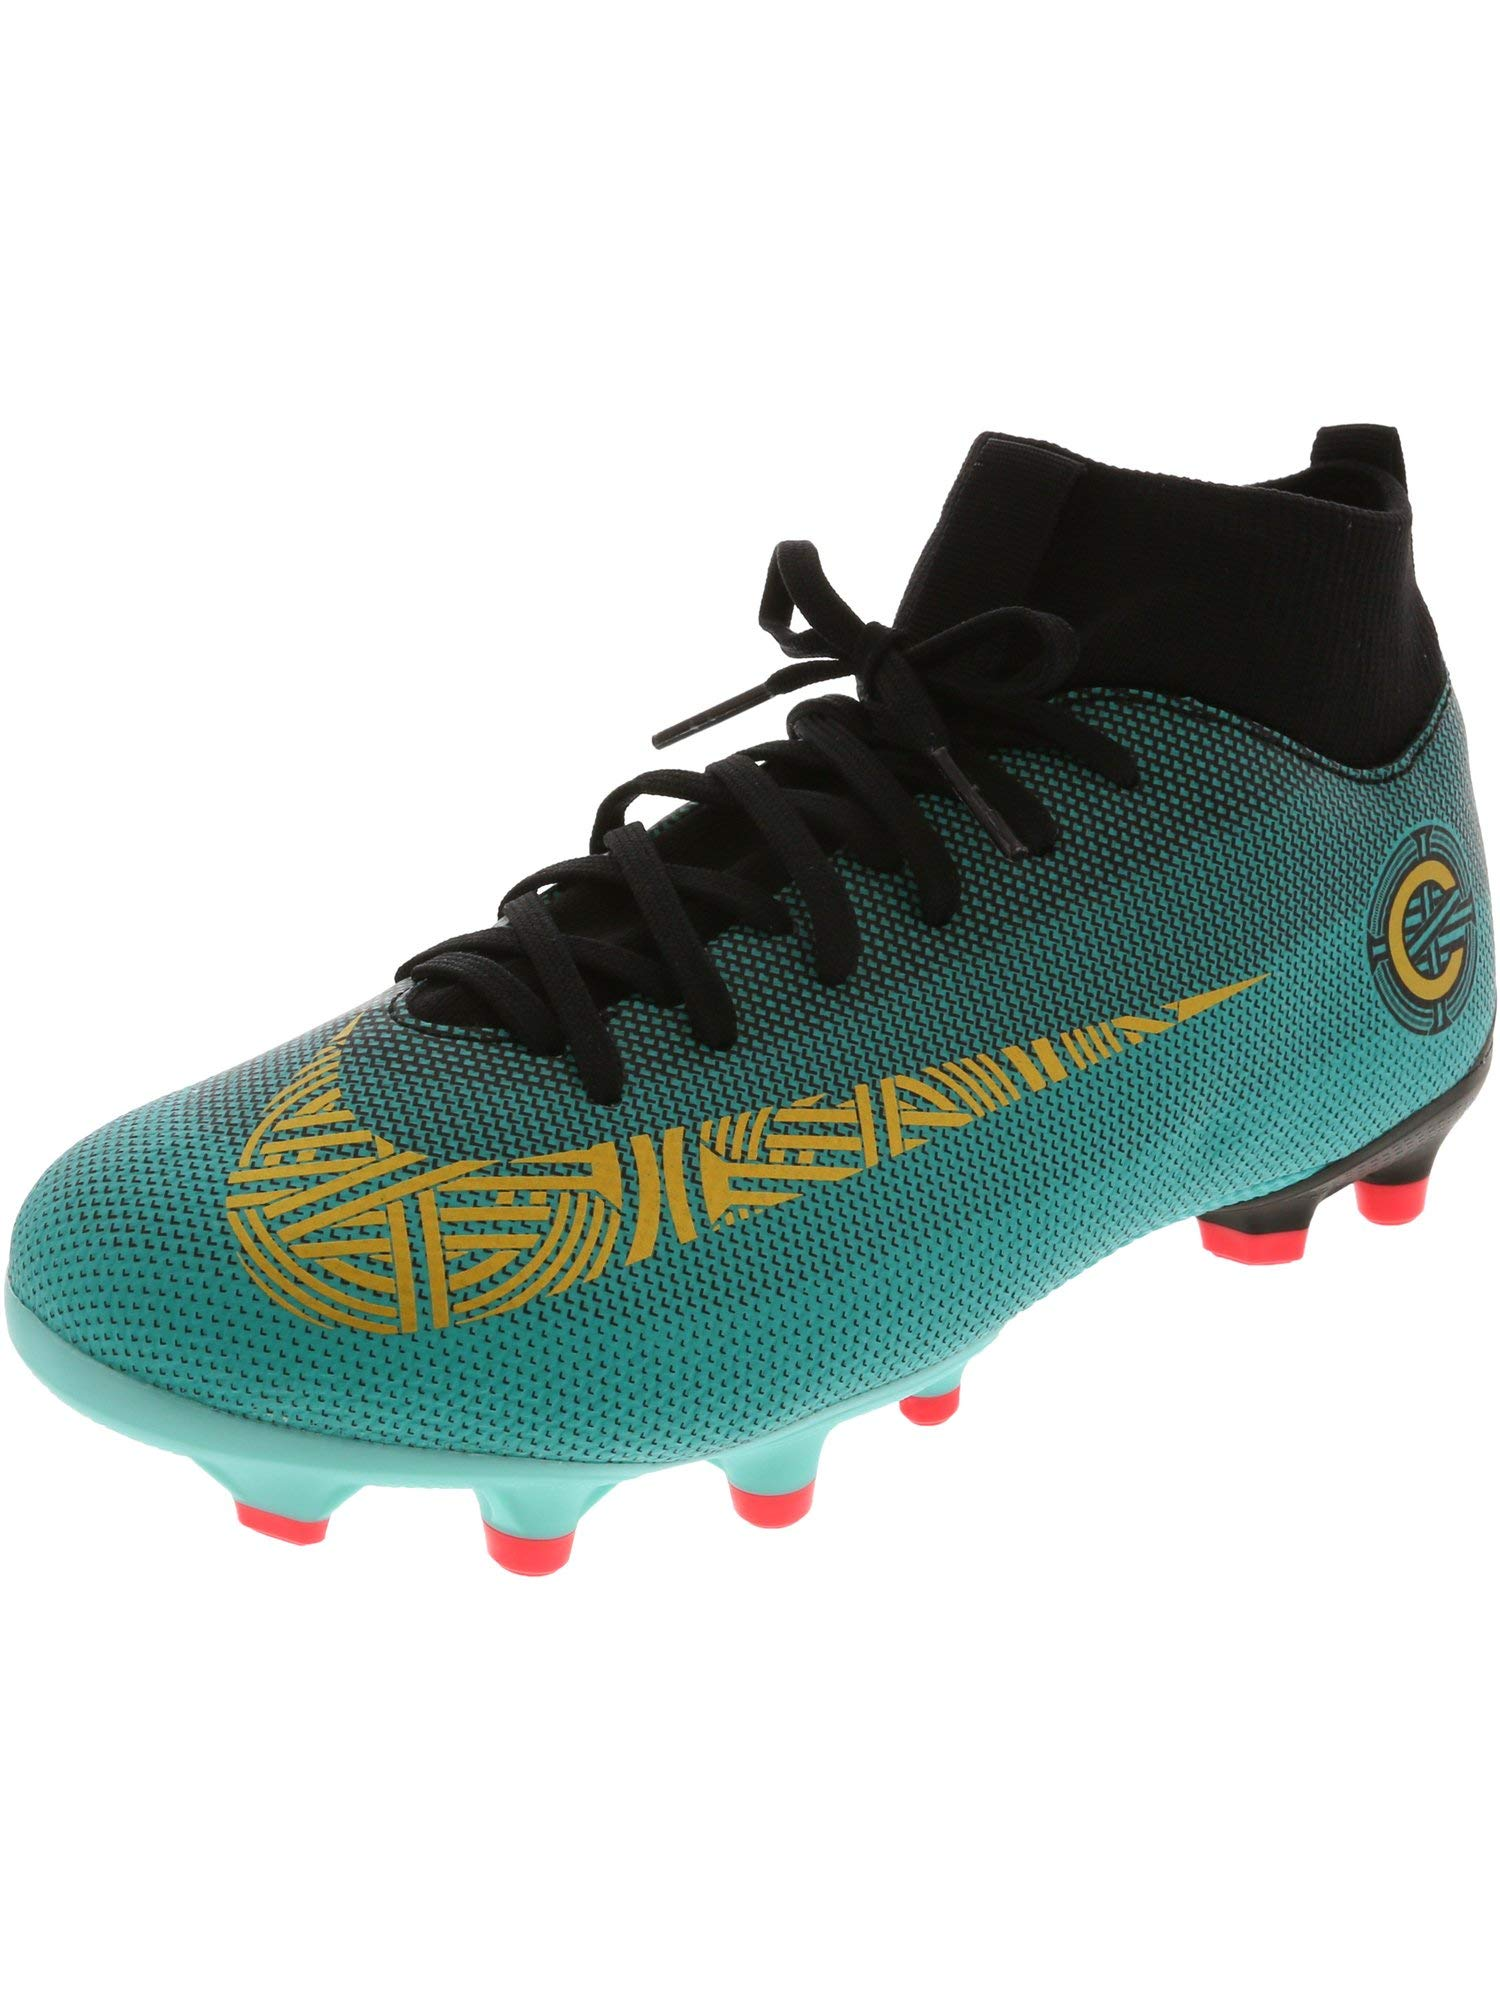 f04707cbcf Nike Superfly 6 Academy Gs Cr7 Clear Jade/Metallic Vivid Gold Ankle-High  Soccer